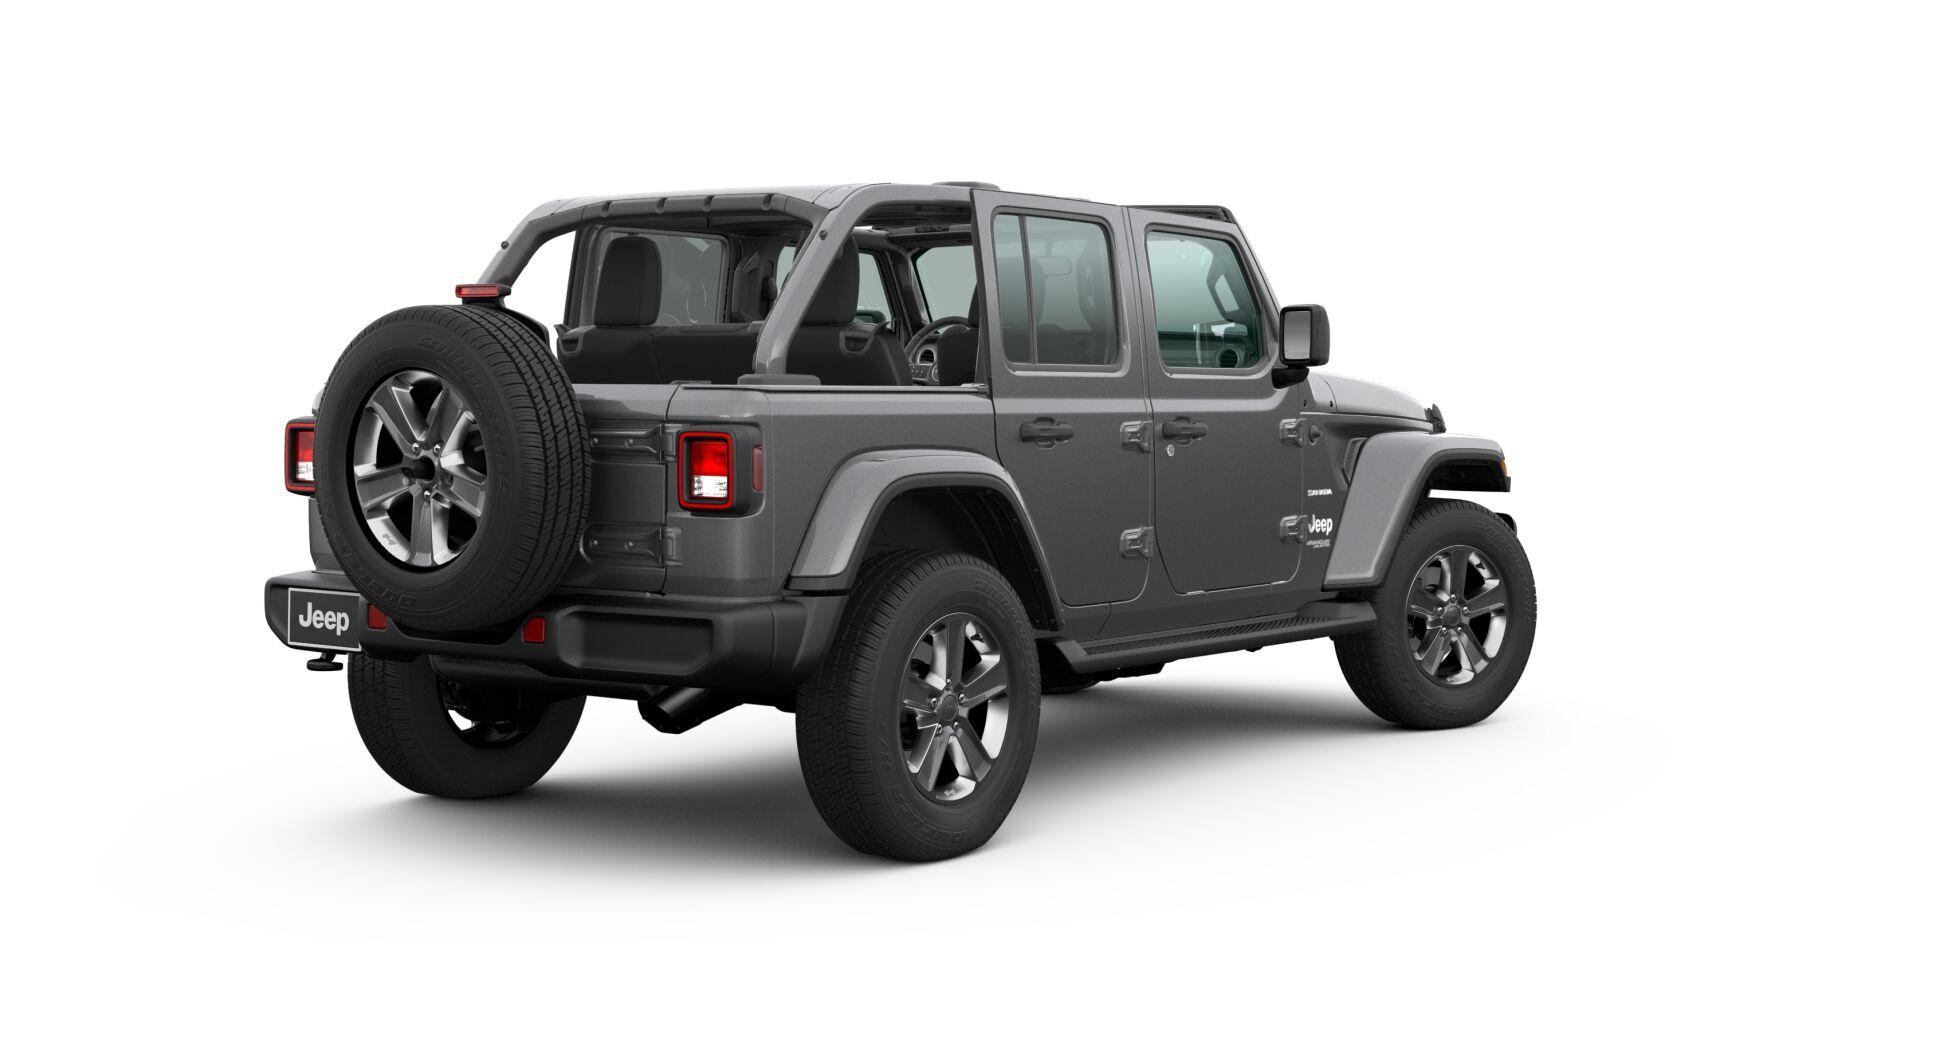 2020 Jeep Wrangler hard top down